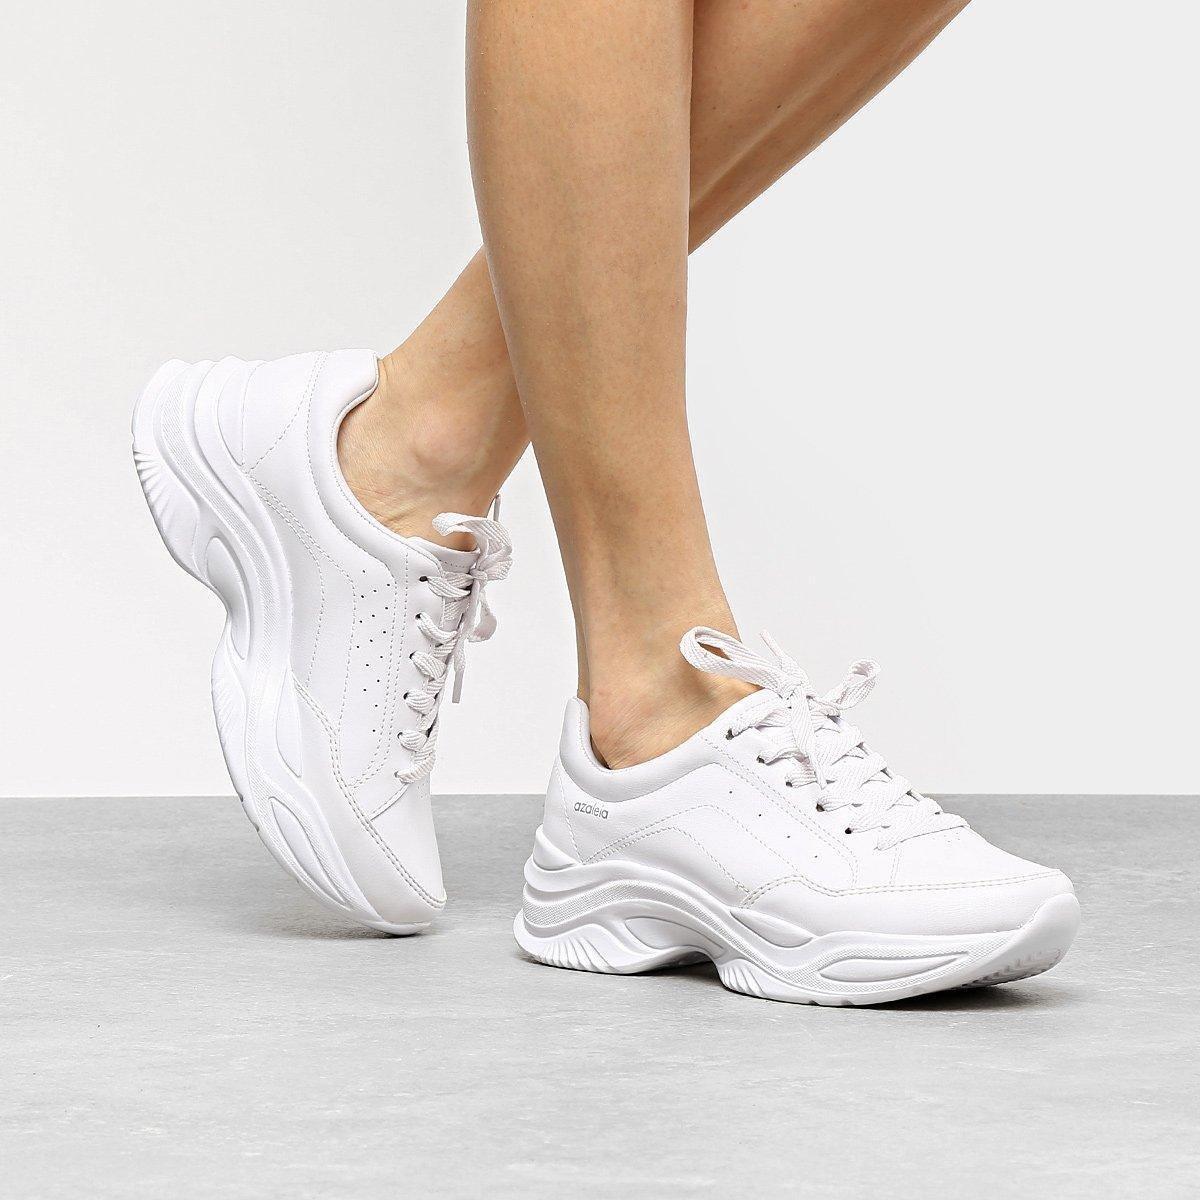 4d2a59c8f5a Tênis Azaleia Chunky Sneaker Feminino - Branco - Compre Agora